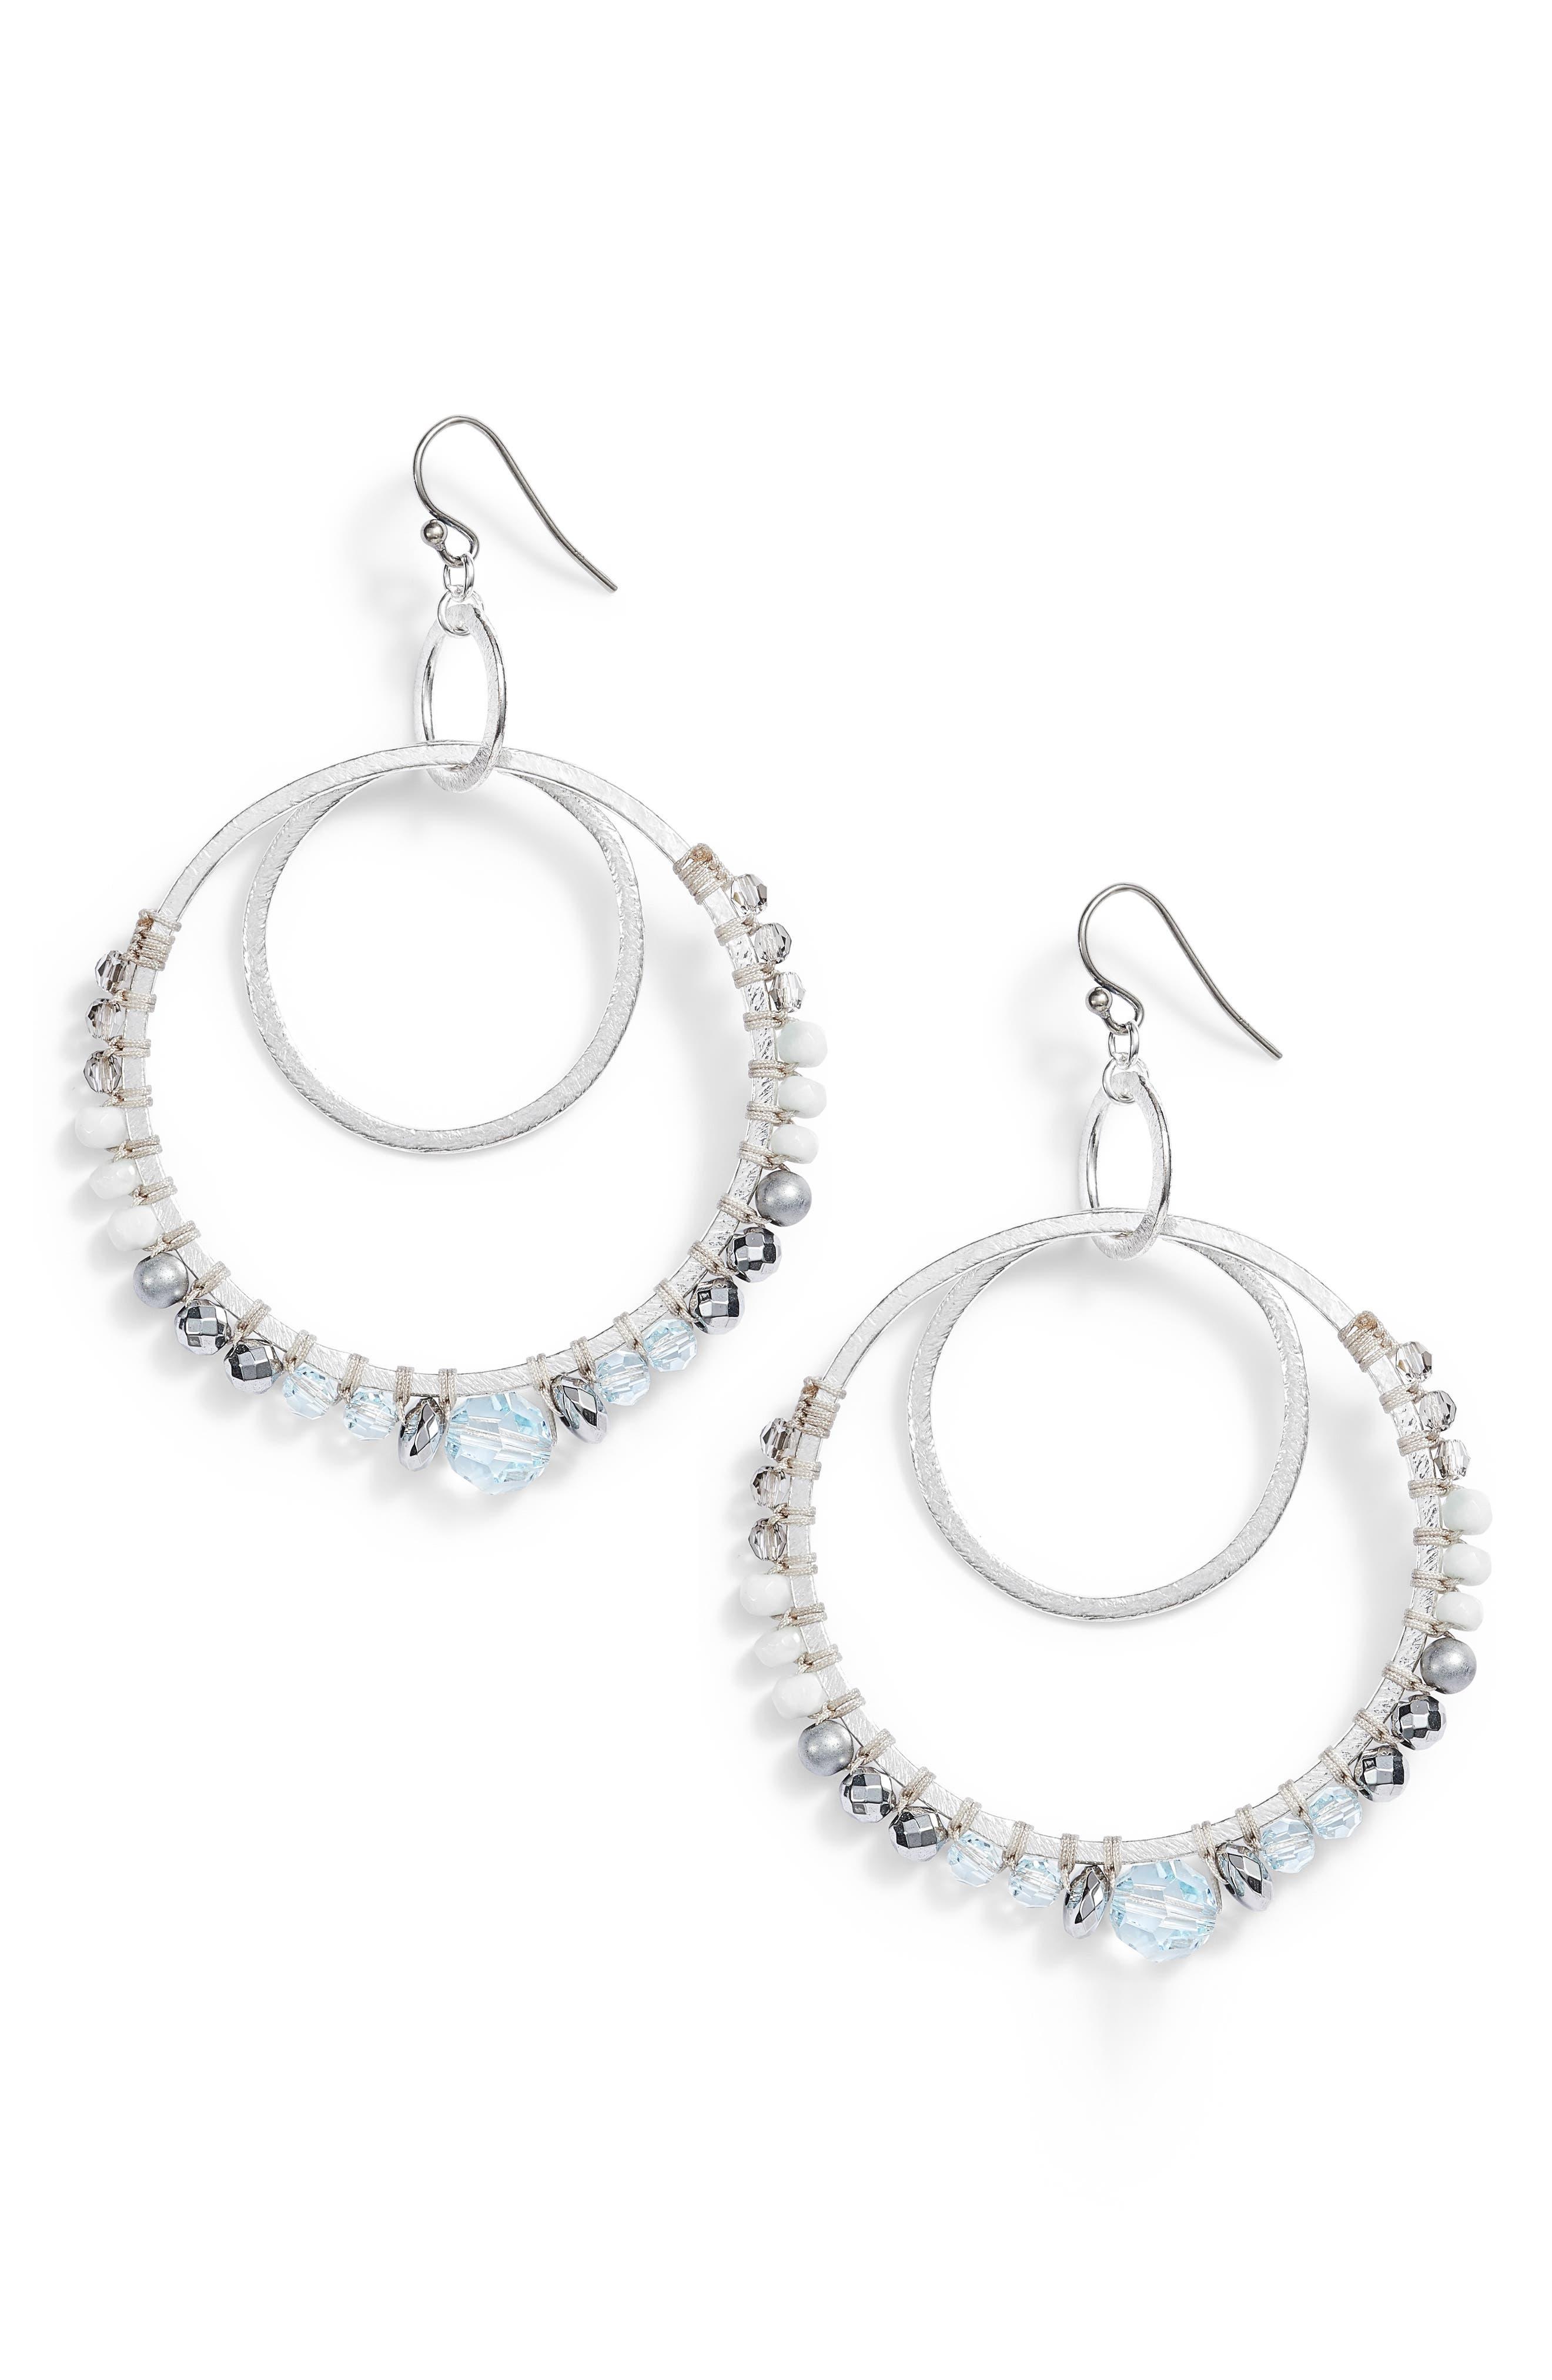 Semiprecious Stone Double Hoop Drop Earrings,                             Main thumbnail 1, color,                             AQUA MIX